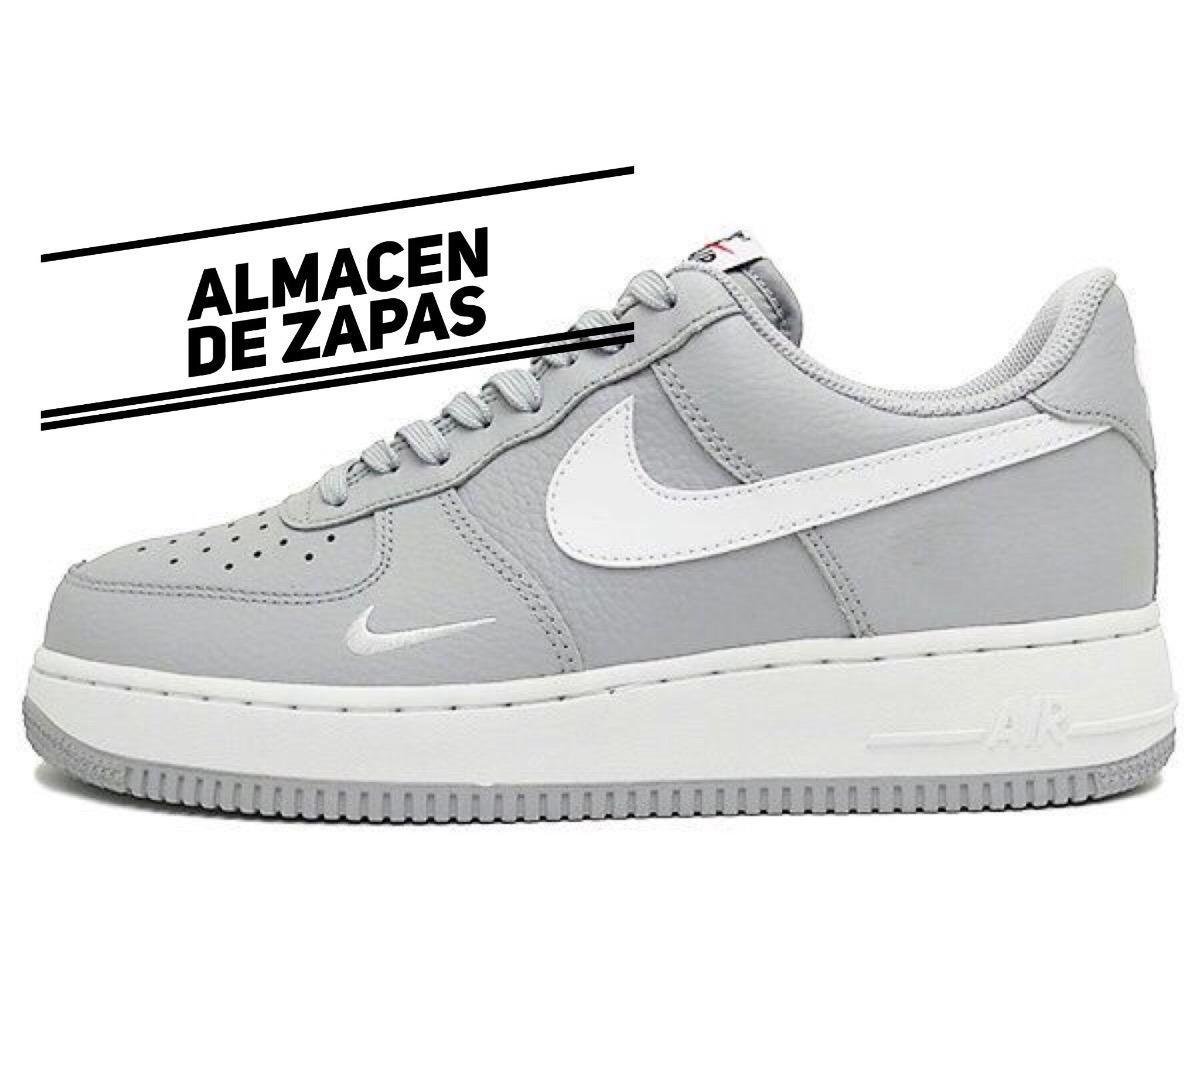 nike hombre zapatillas 2017 air force